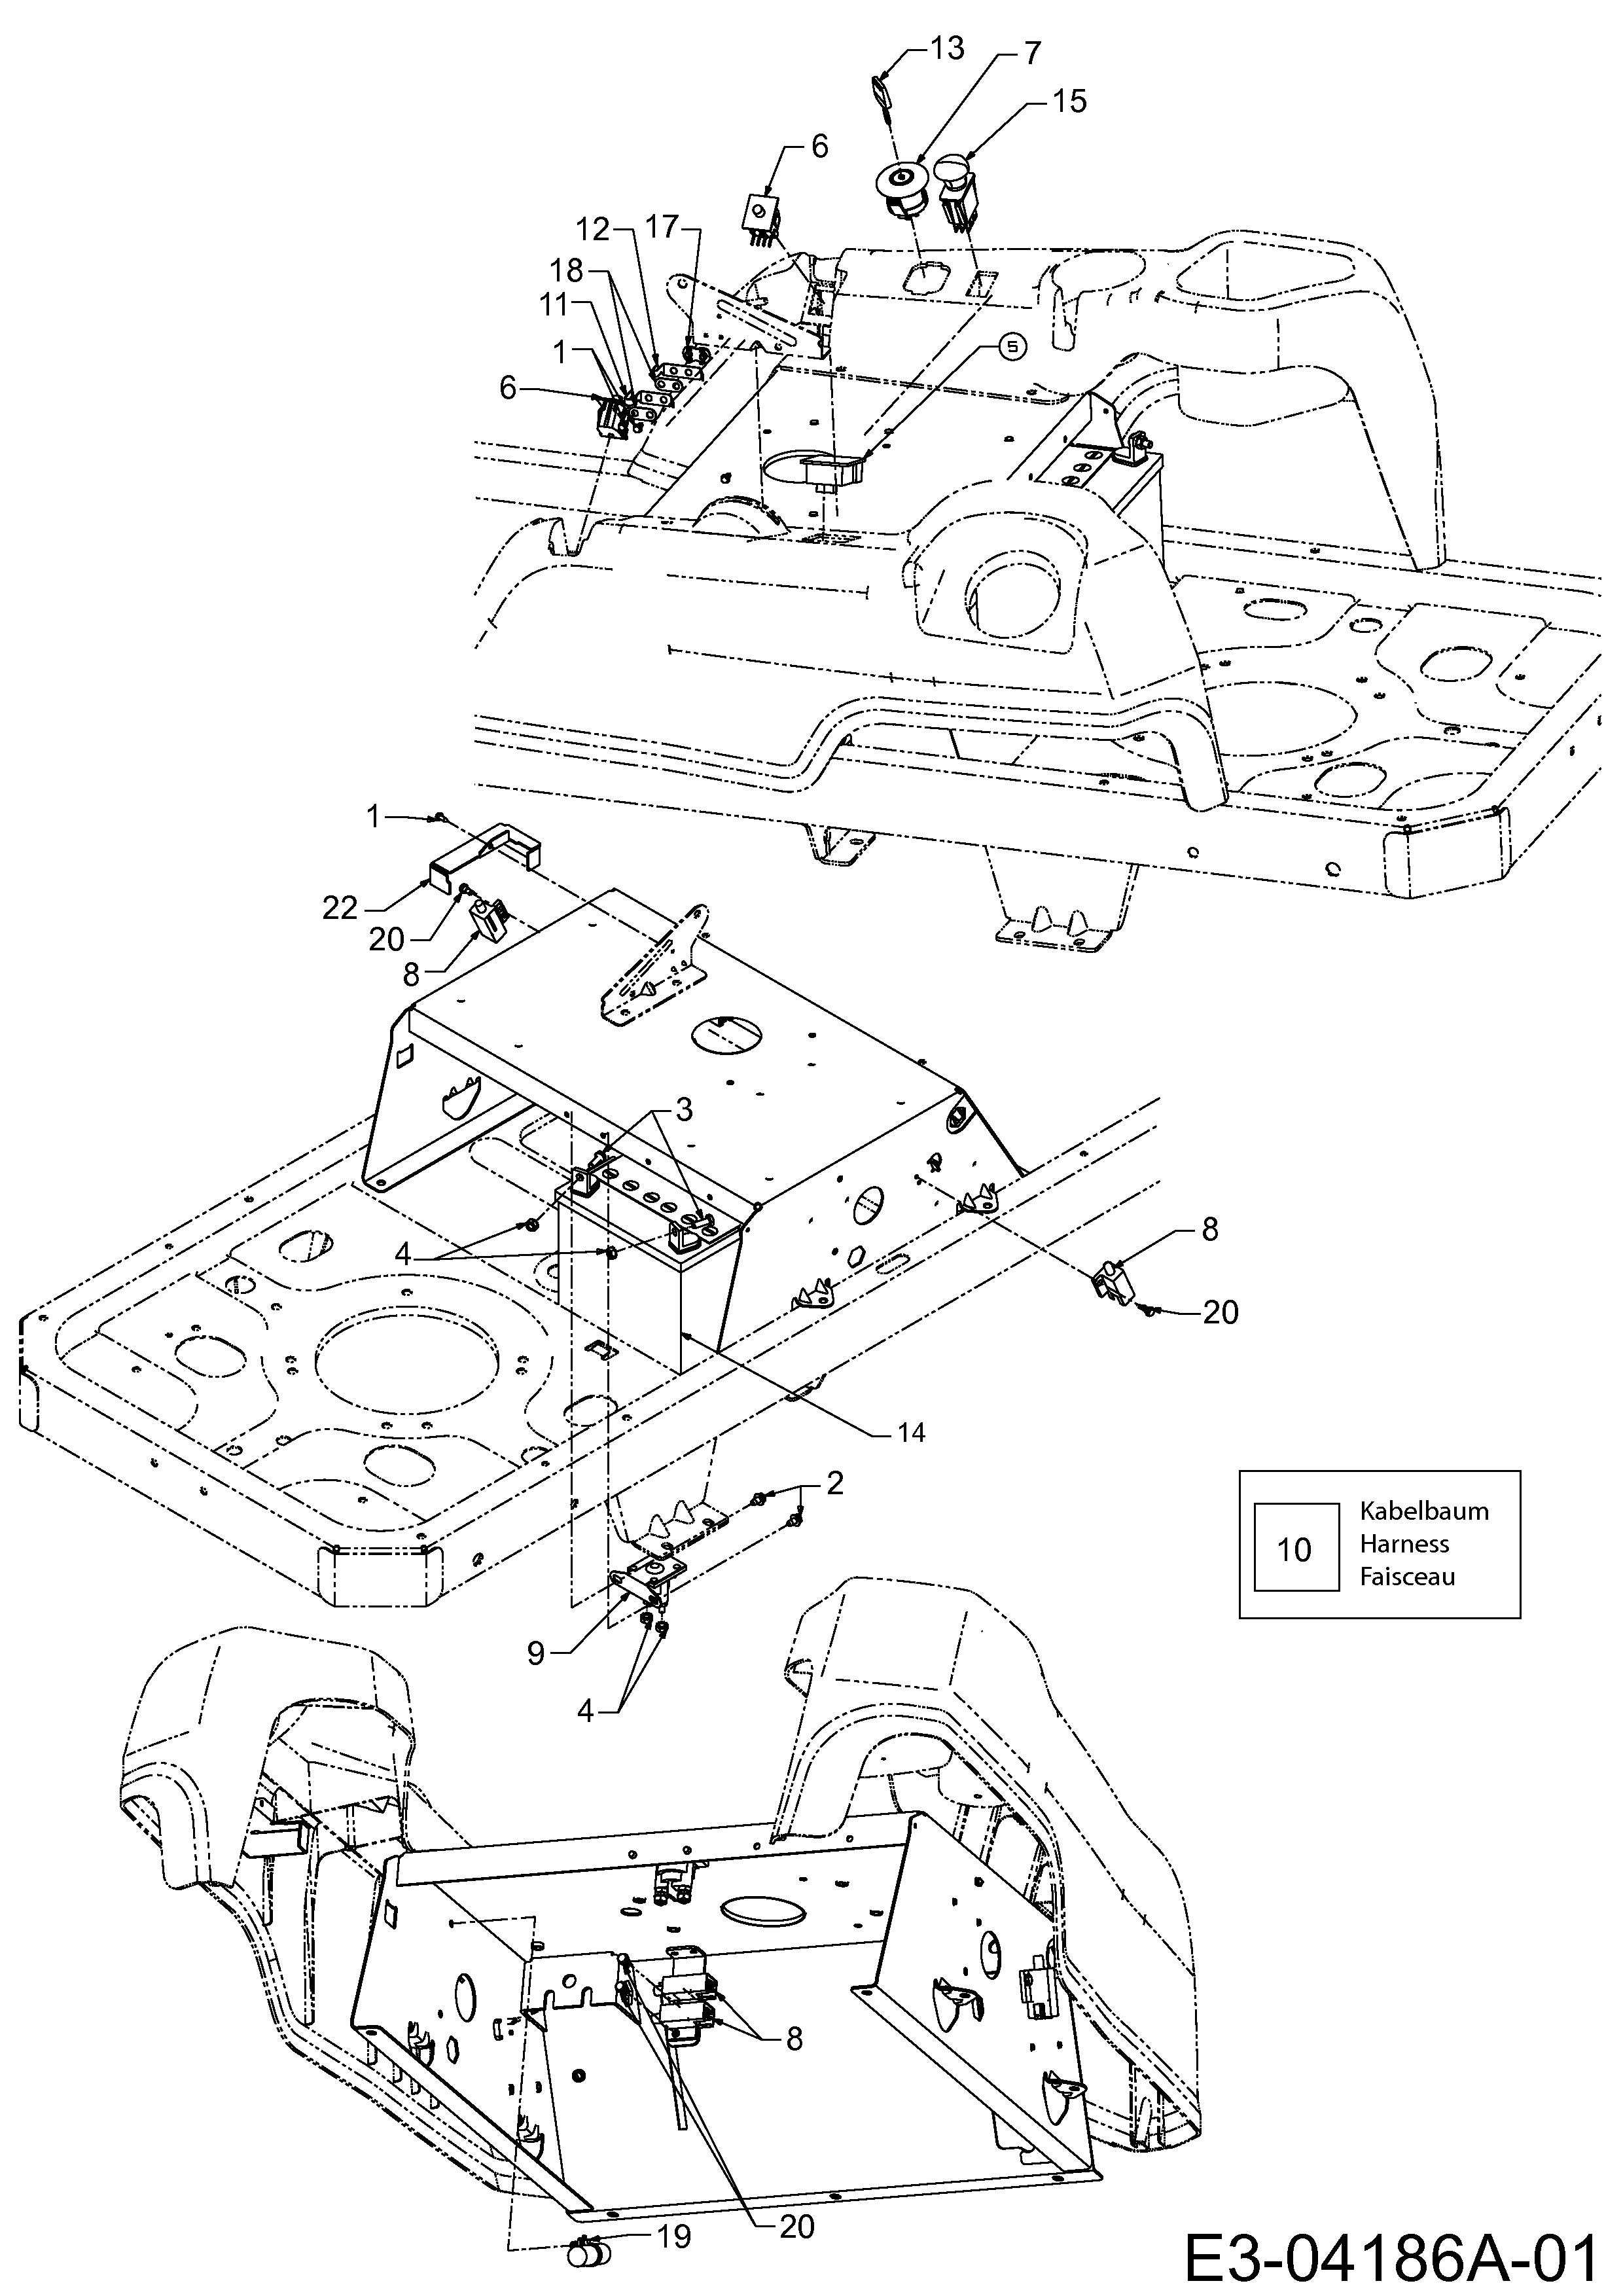 Cub Cadet RZT 50 Elektroteile, Schaltplan 17AI2ACP603 (2008)